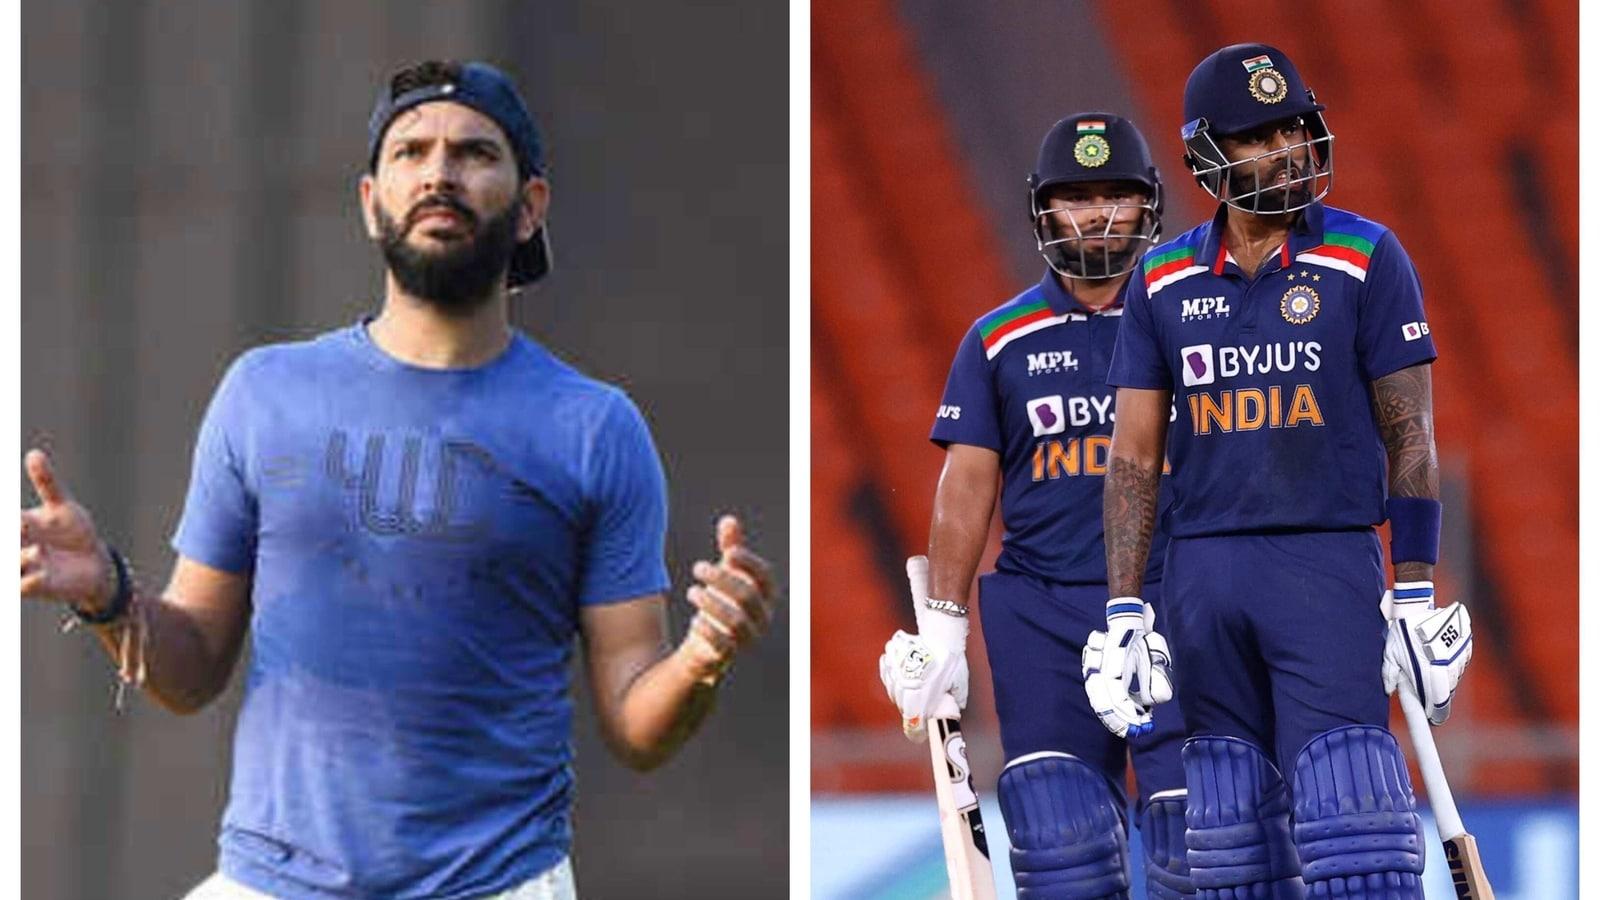 'In my World Cup squad for sure': Yuvraj Singh's big praise for India newcomer Suryakumar Yadav - Hindustan Times